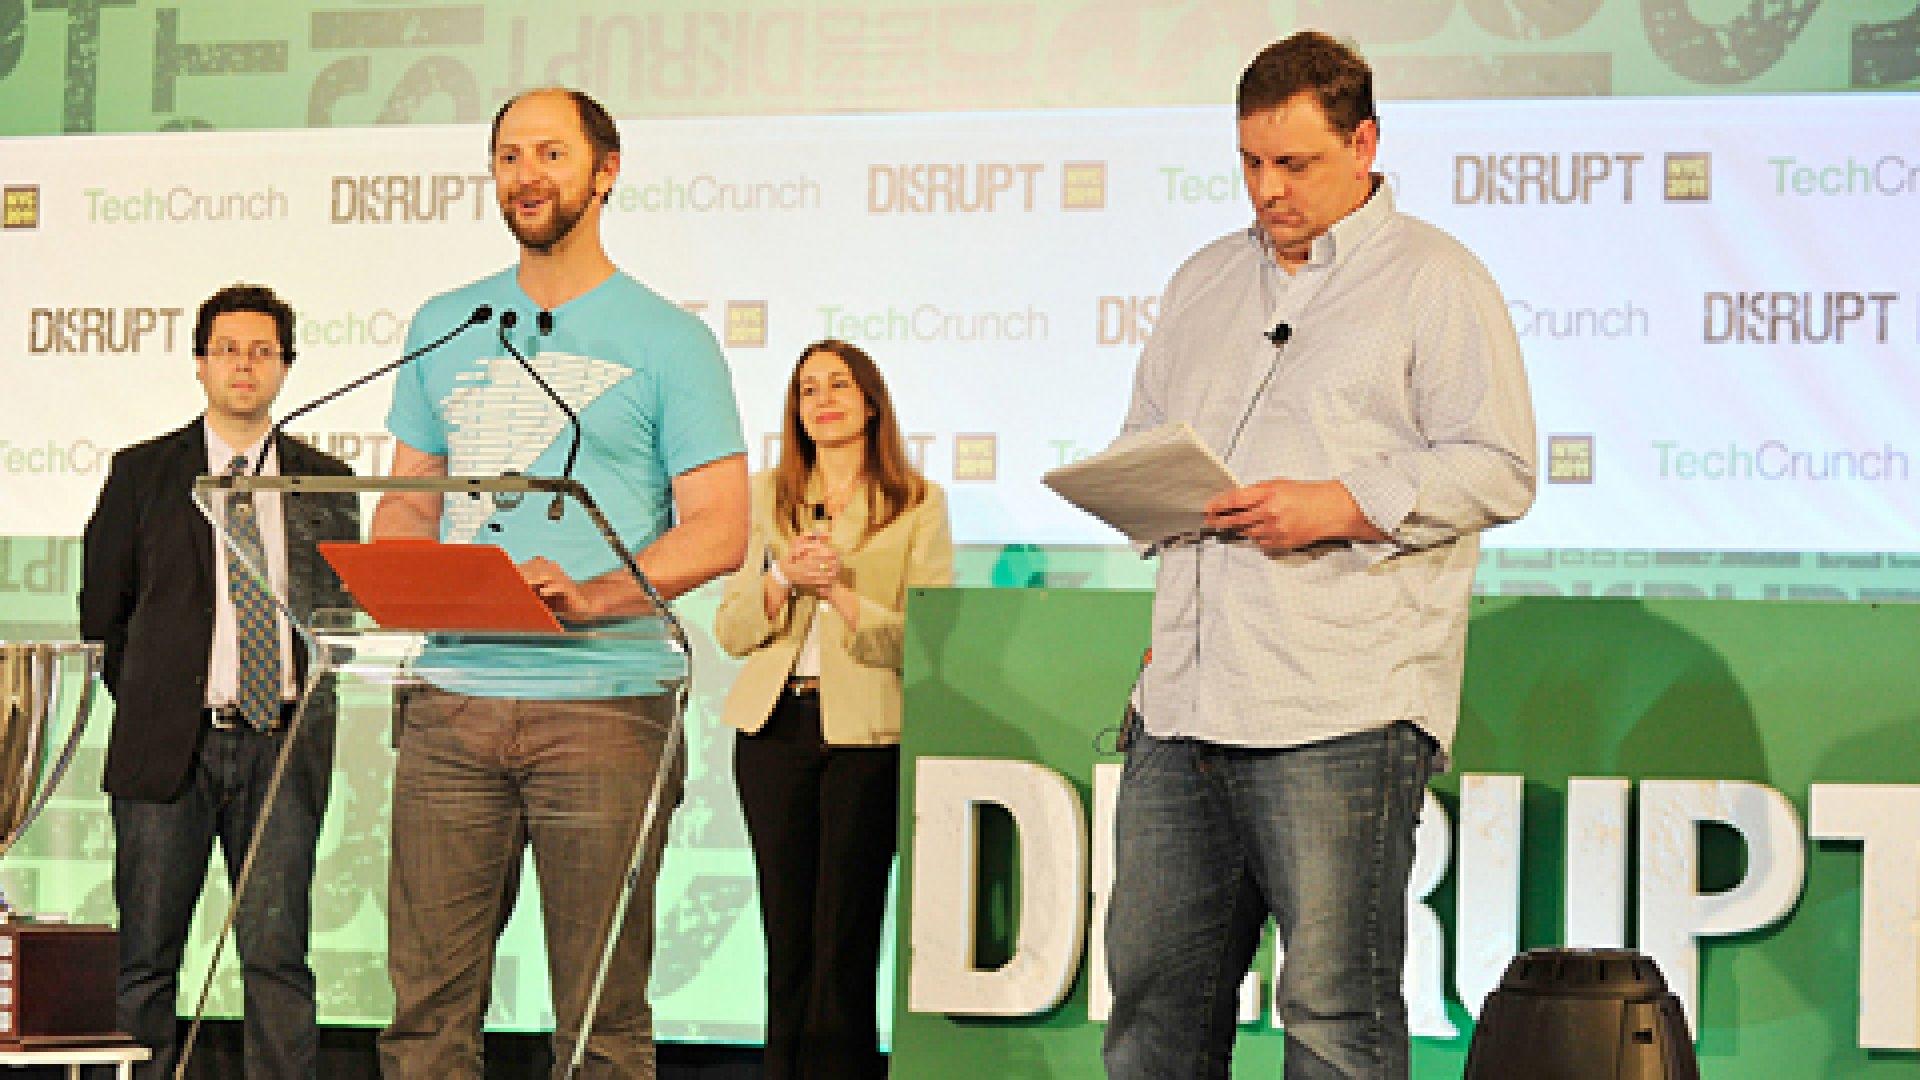 (L-R) Erick Schonfeld, Barney Pell, Heather Harde, and J. Michael Arrington speak at TechCrunch Disrupt New York May 2011 at Pier 94